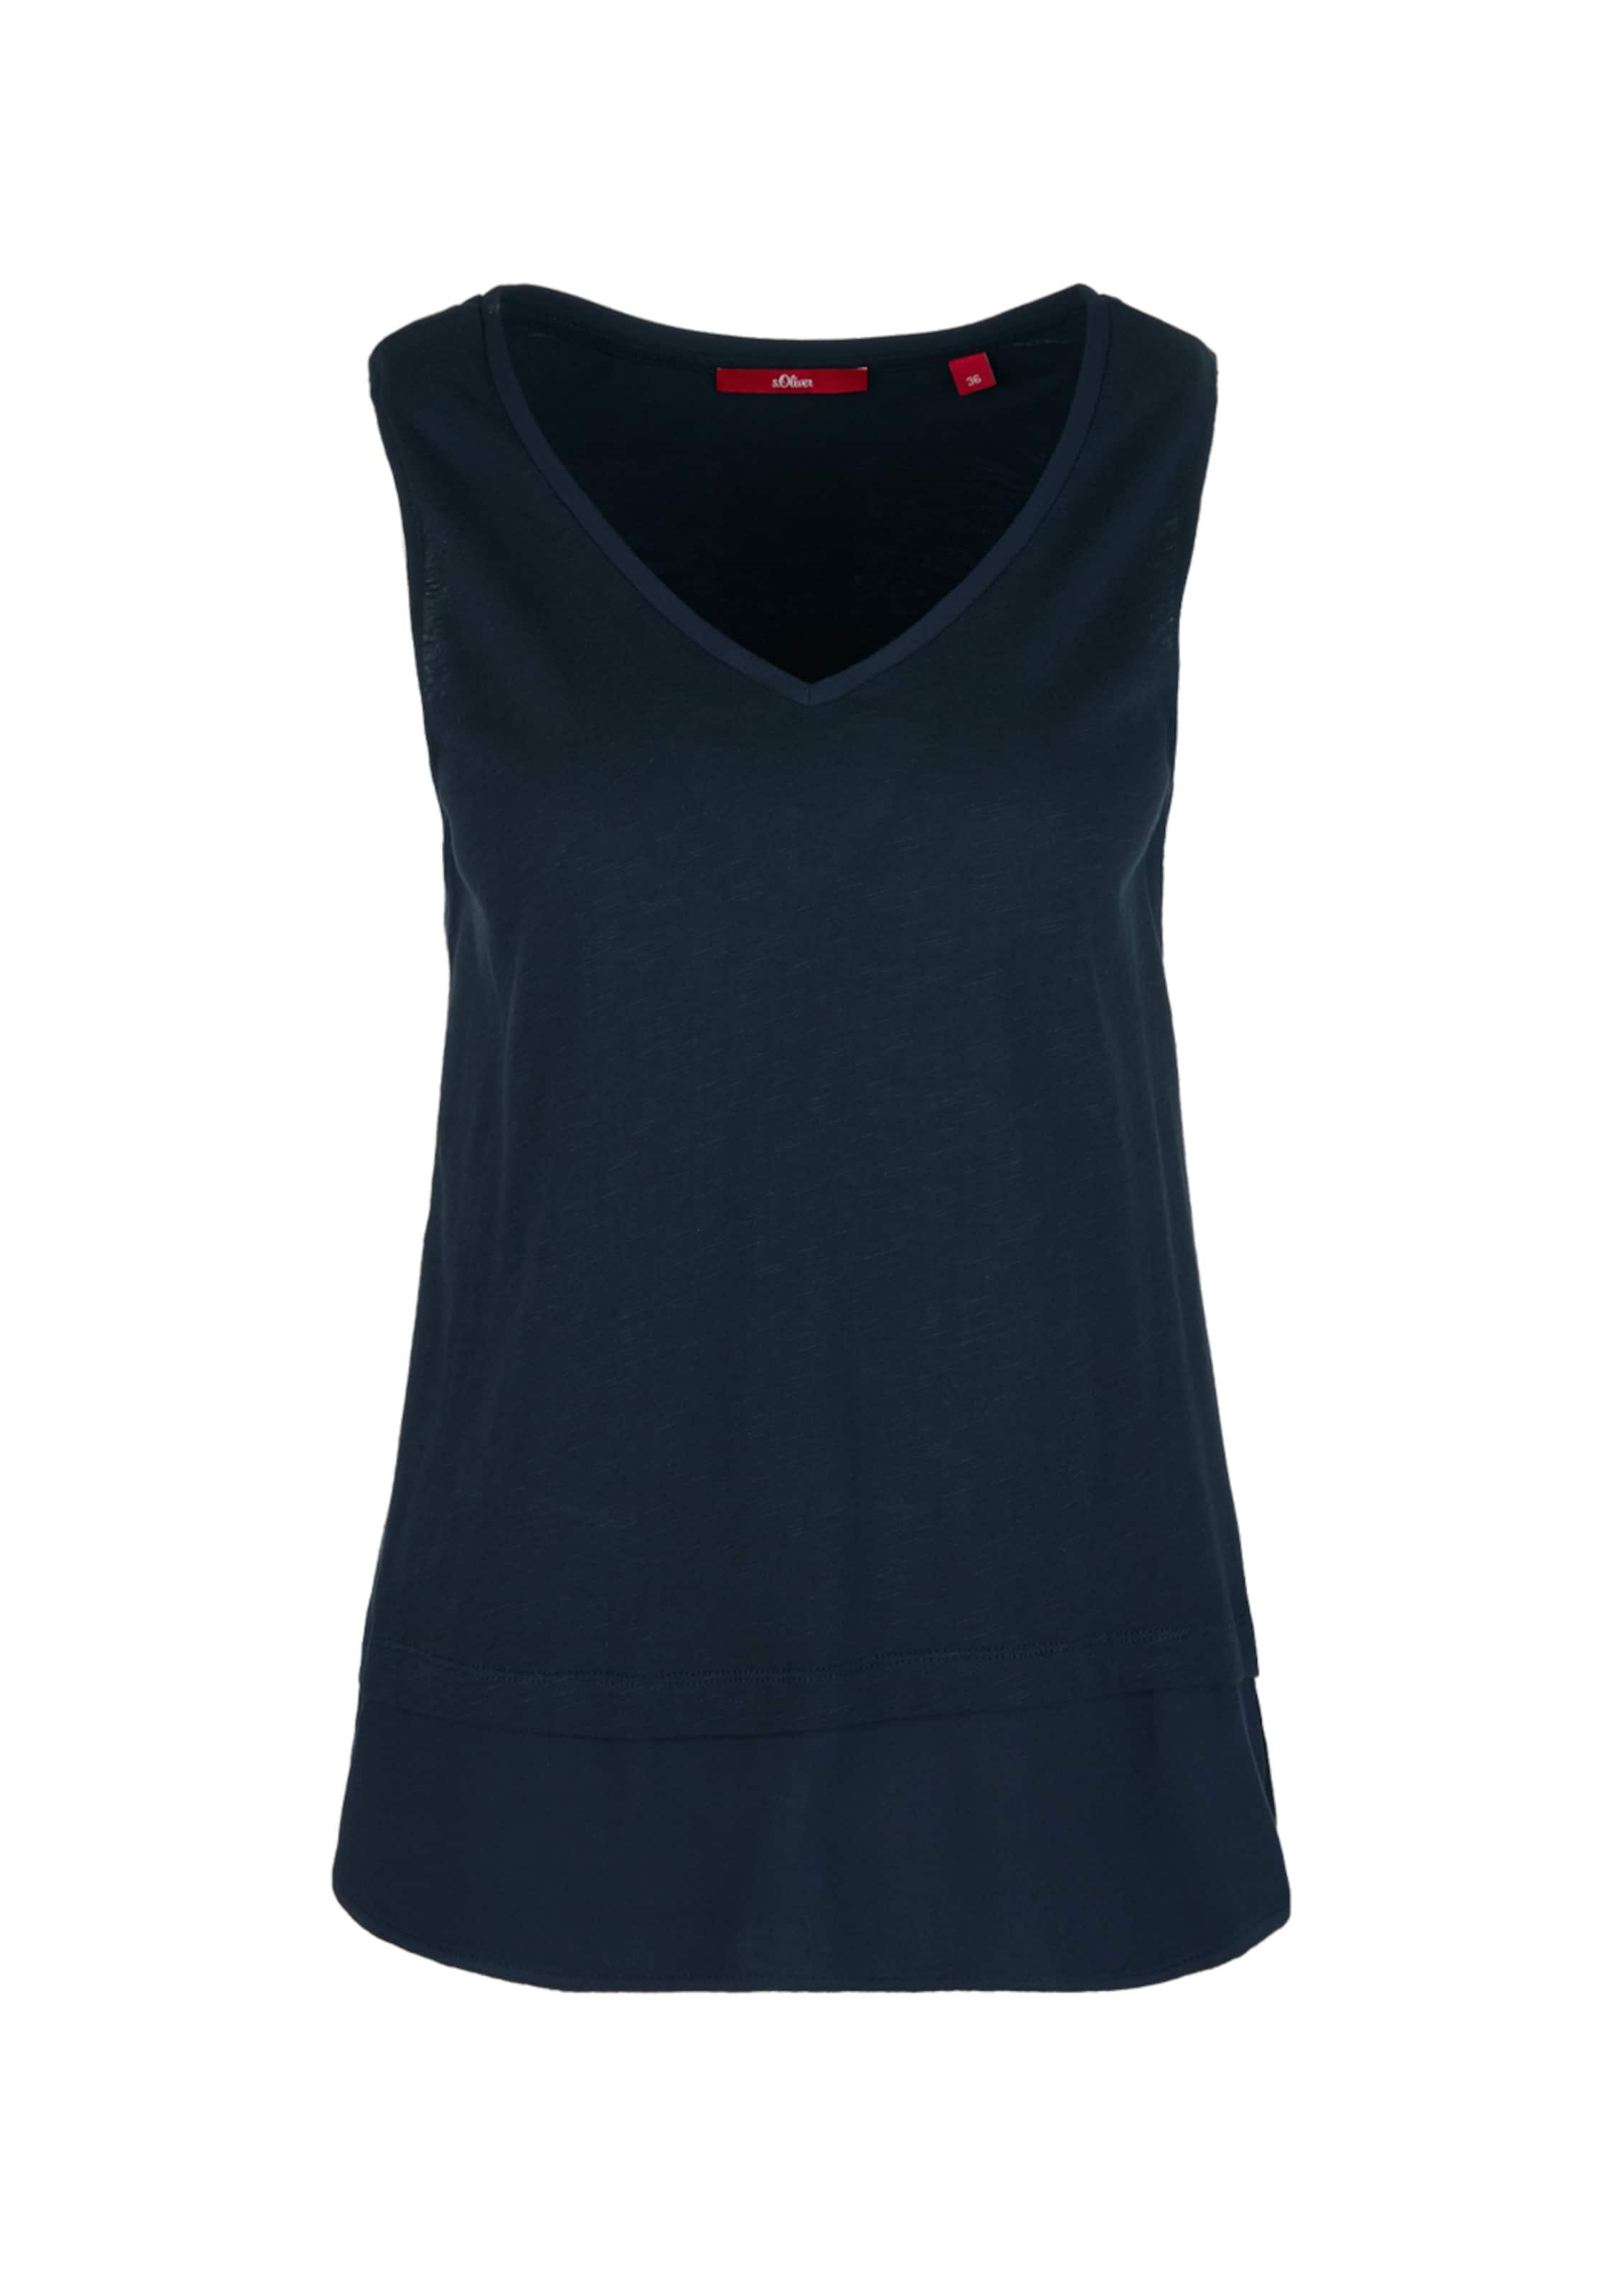 S Label oliver Top Ultramarinblau Red In F13JuTlKc5